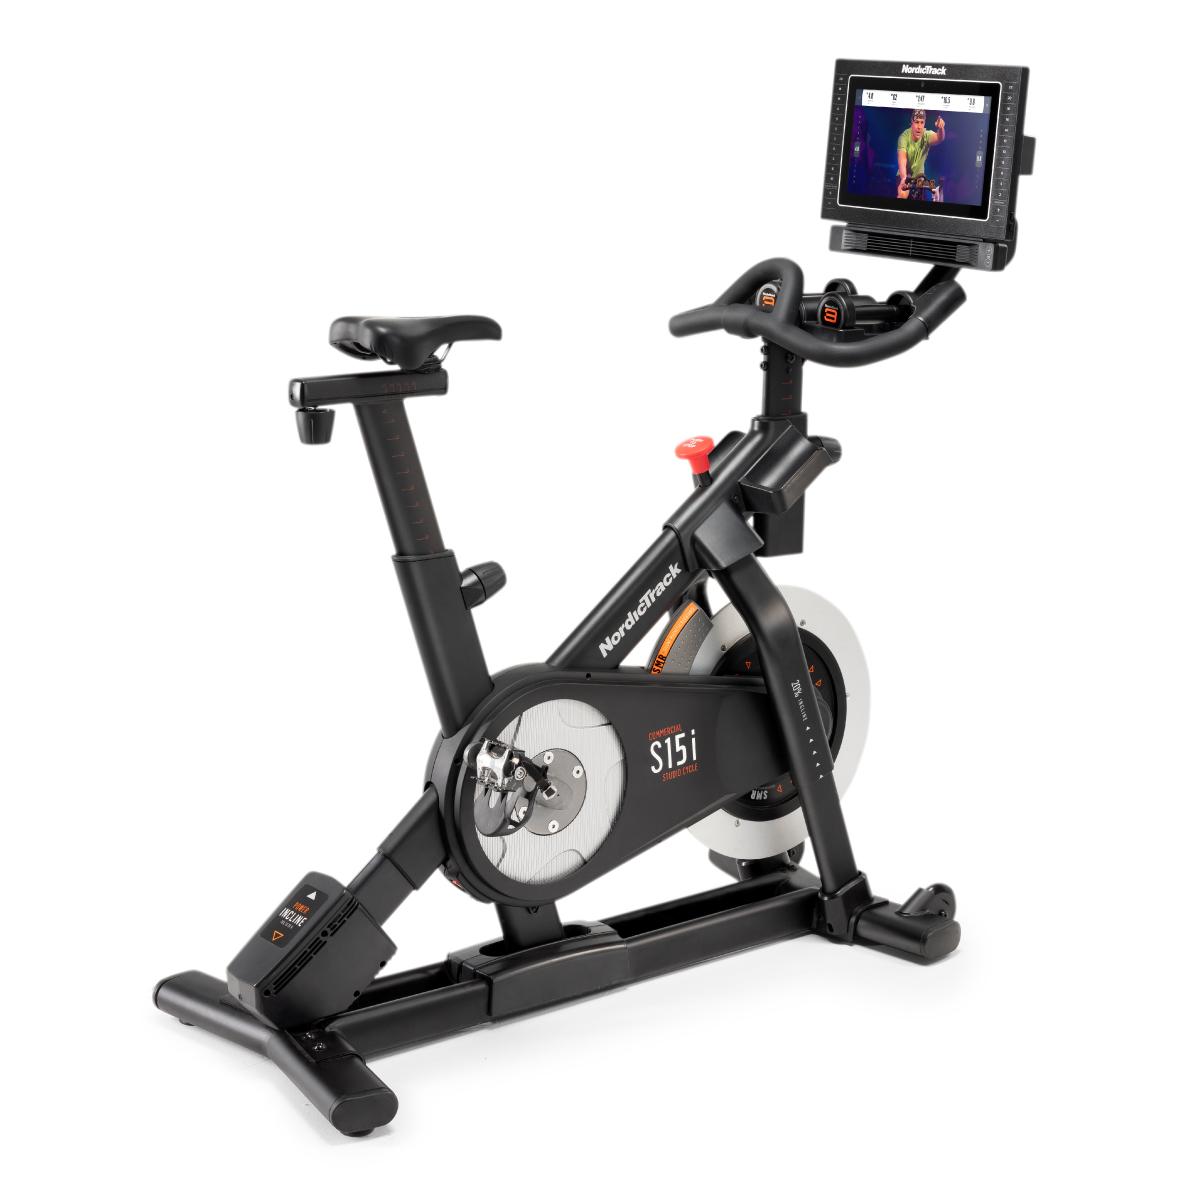 Bicicleta NordicTrack Commercial s15i Studio Cycle